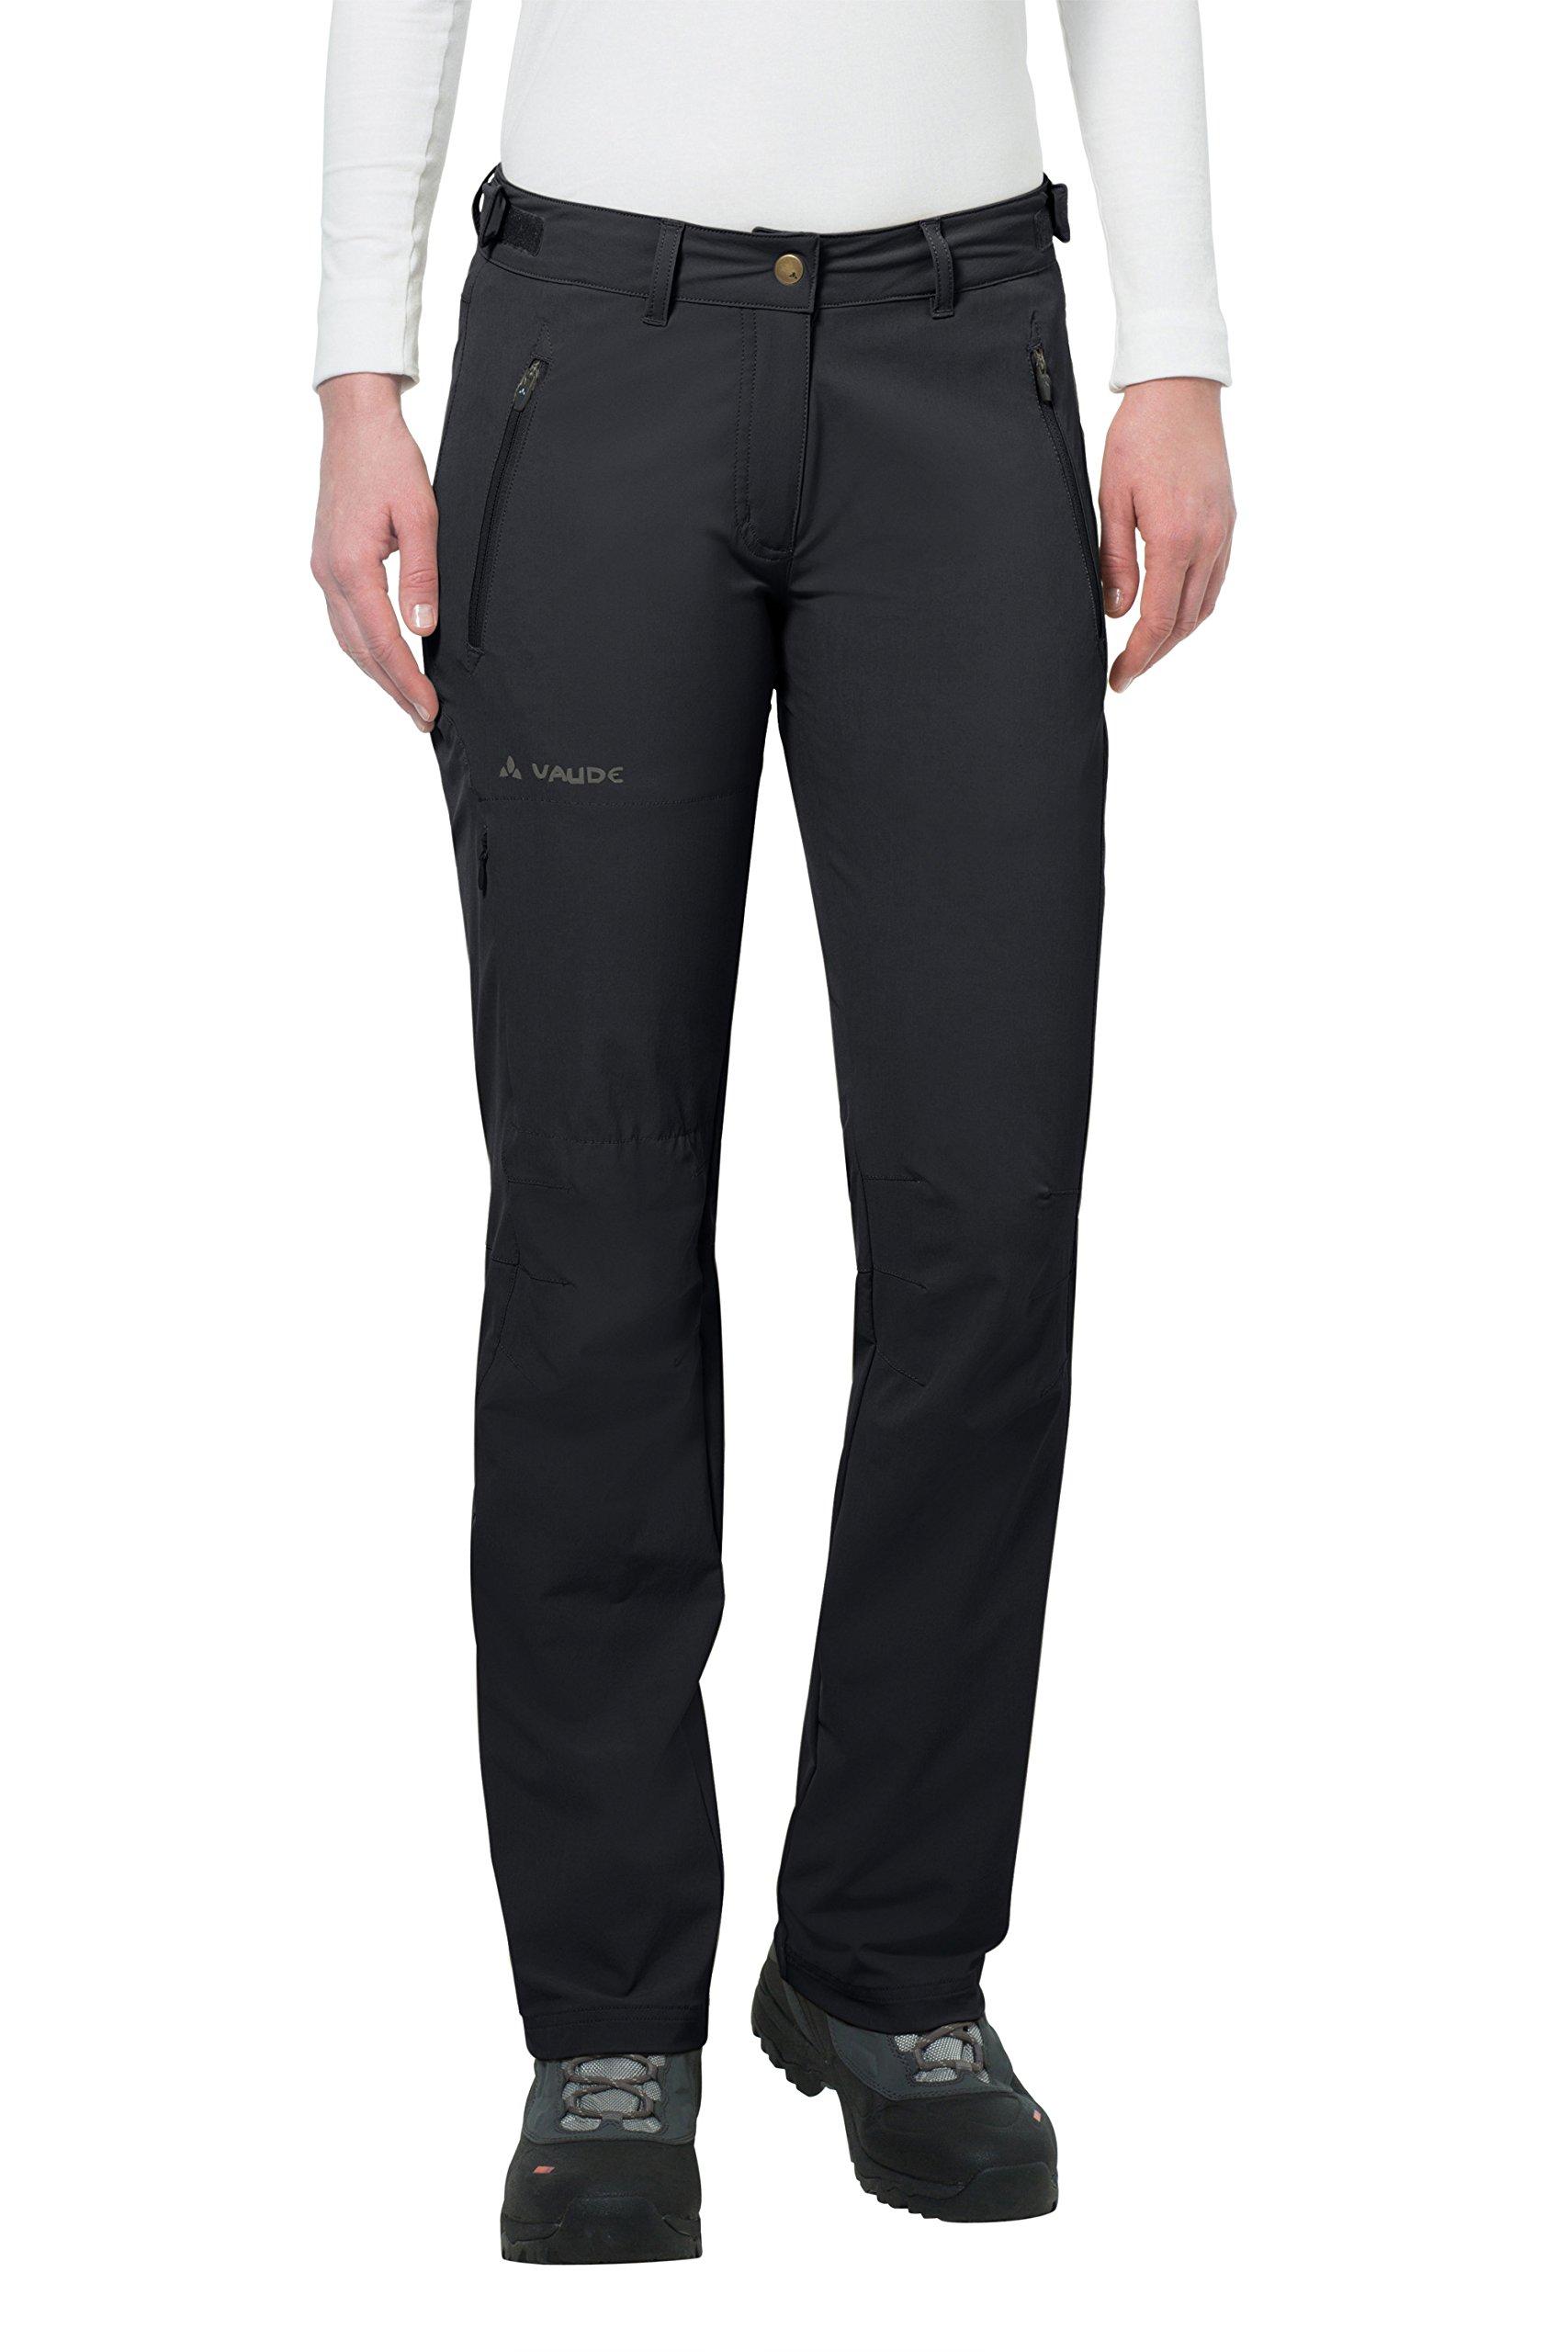 VAUDE Women's Farley Stretch II Pants, Black, Size 40